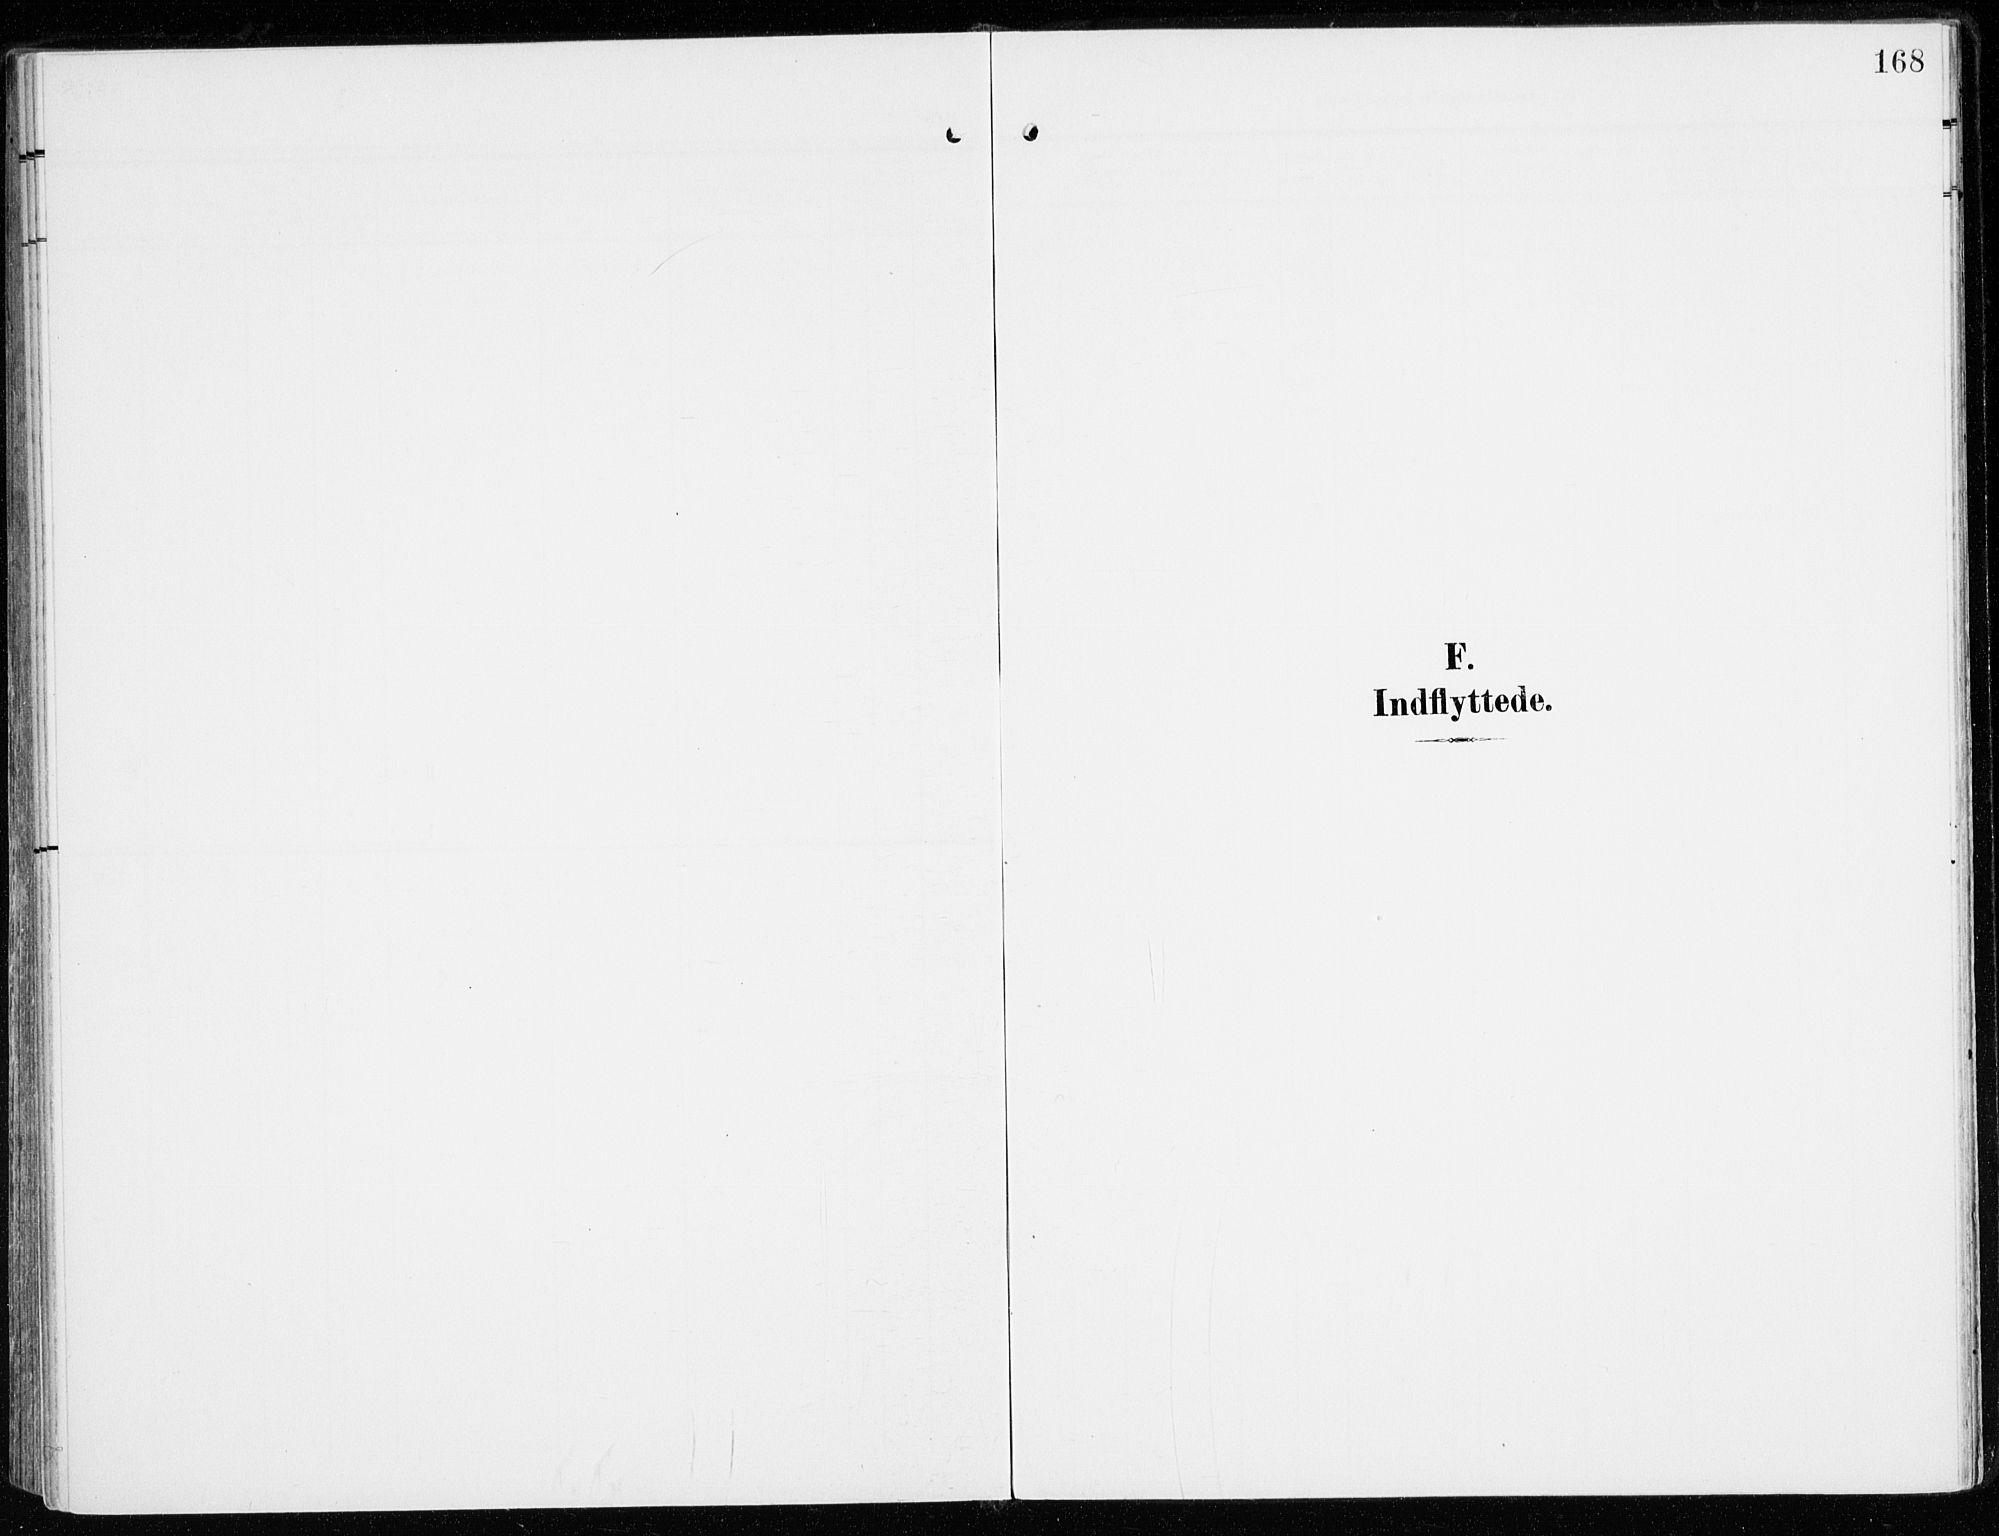 SAH, Sel prestekontor, Ministerialbok nr. 2, 1905-1919, s. 168